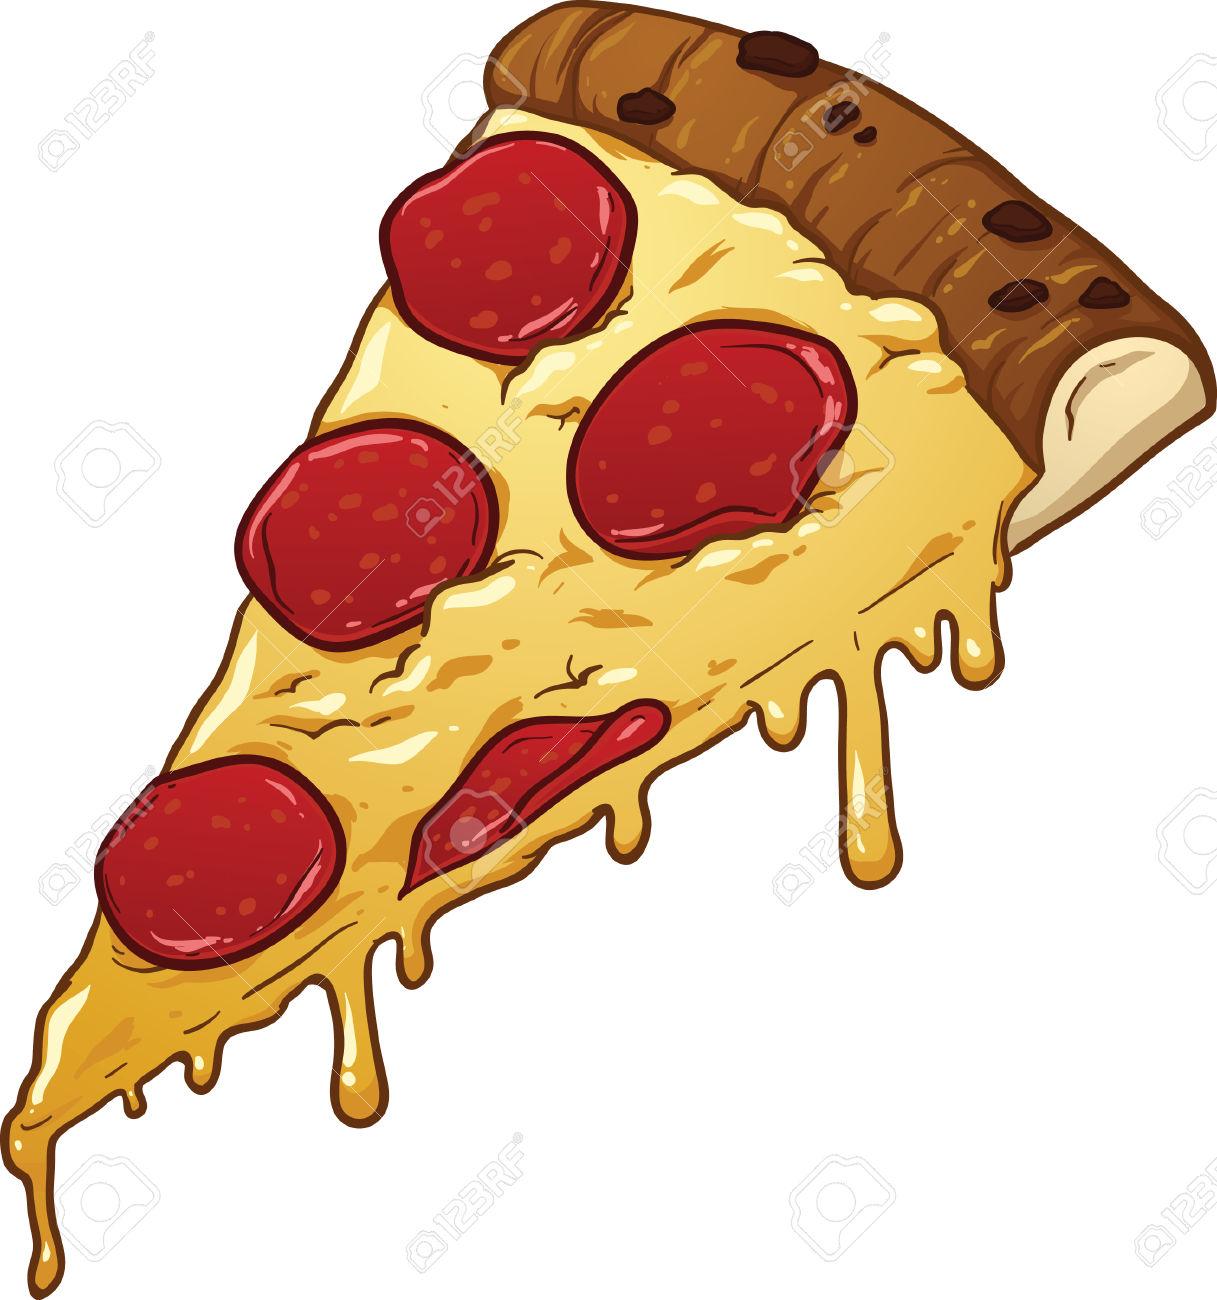 Salami Pizza Slice Clipart-Salami Pizza Slice Clipart-6